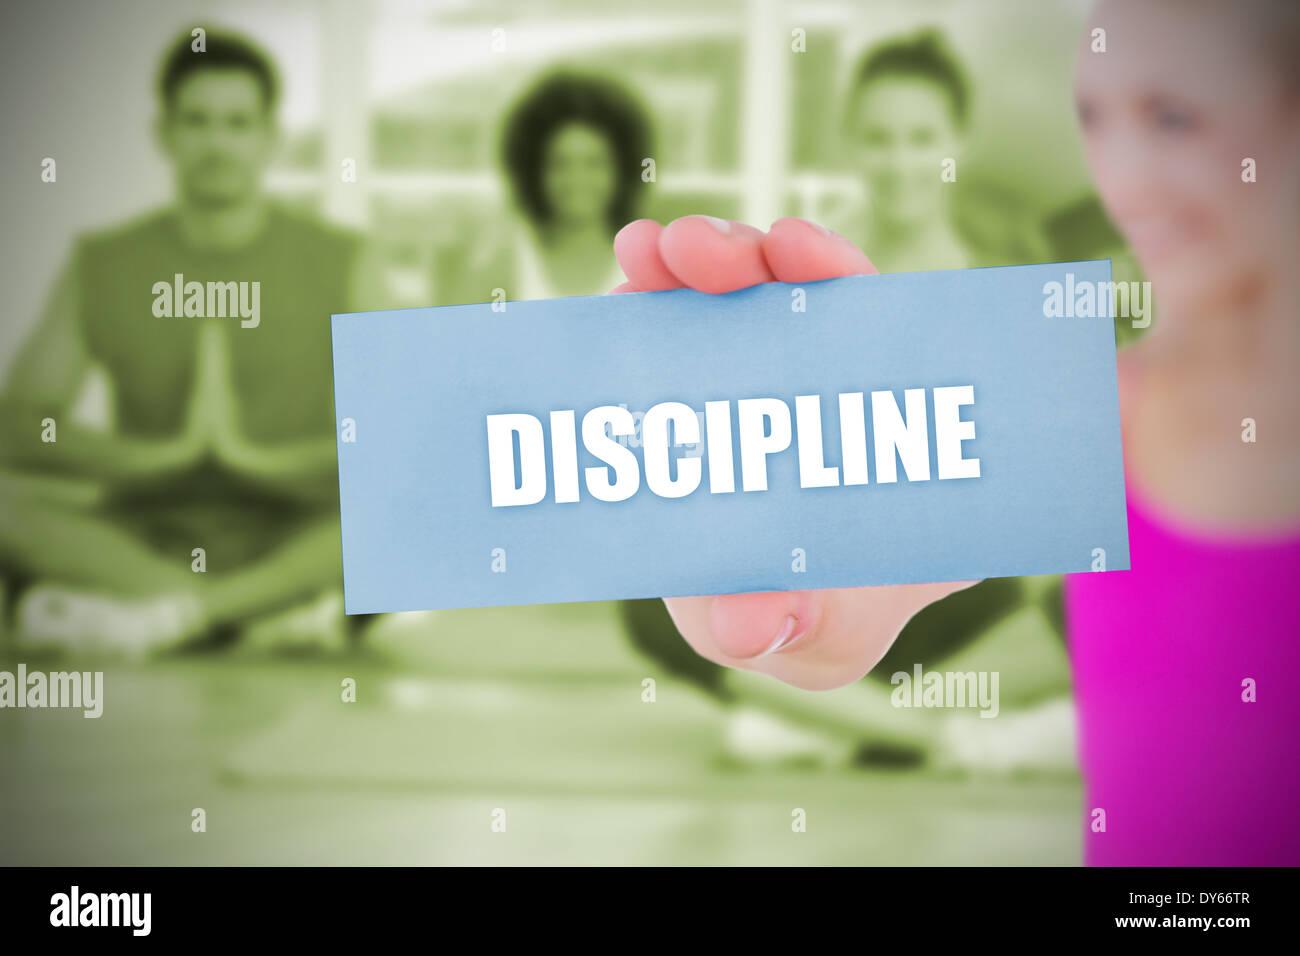 Fit Blondine hält Karte Spruch Disziplin Stockbild